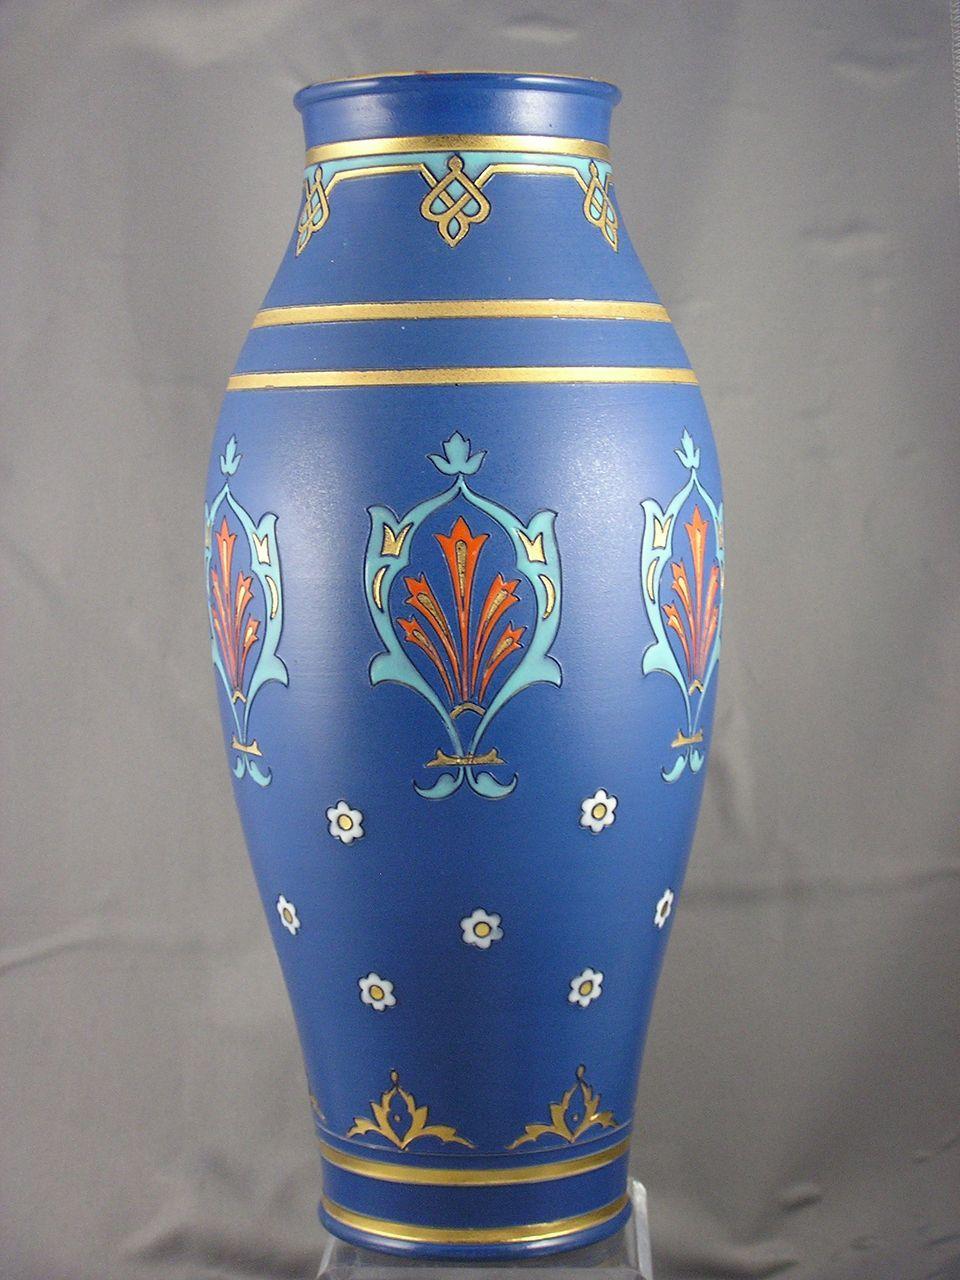 Large villeroy boch mettlach germany arts crafts vase c1910 large villeroy boch mettlach germany arts crafts vase c1910 reviewsmspy